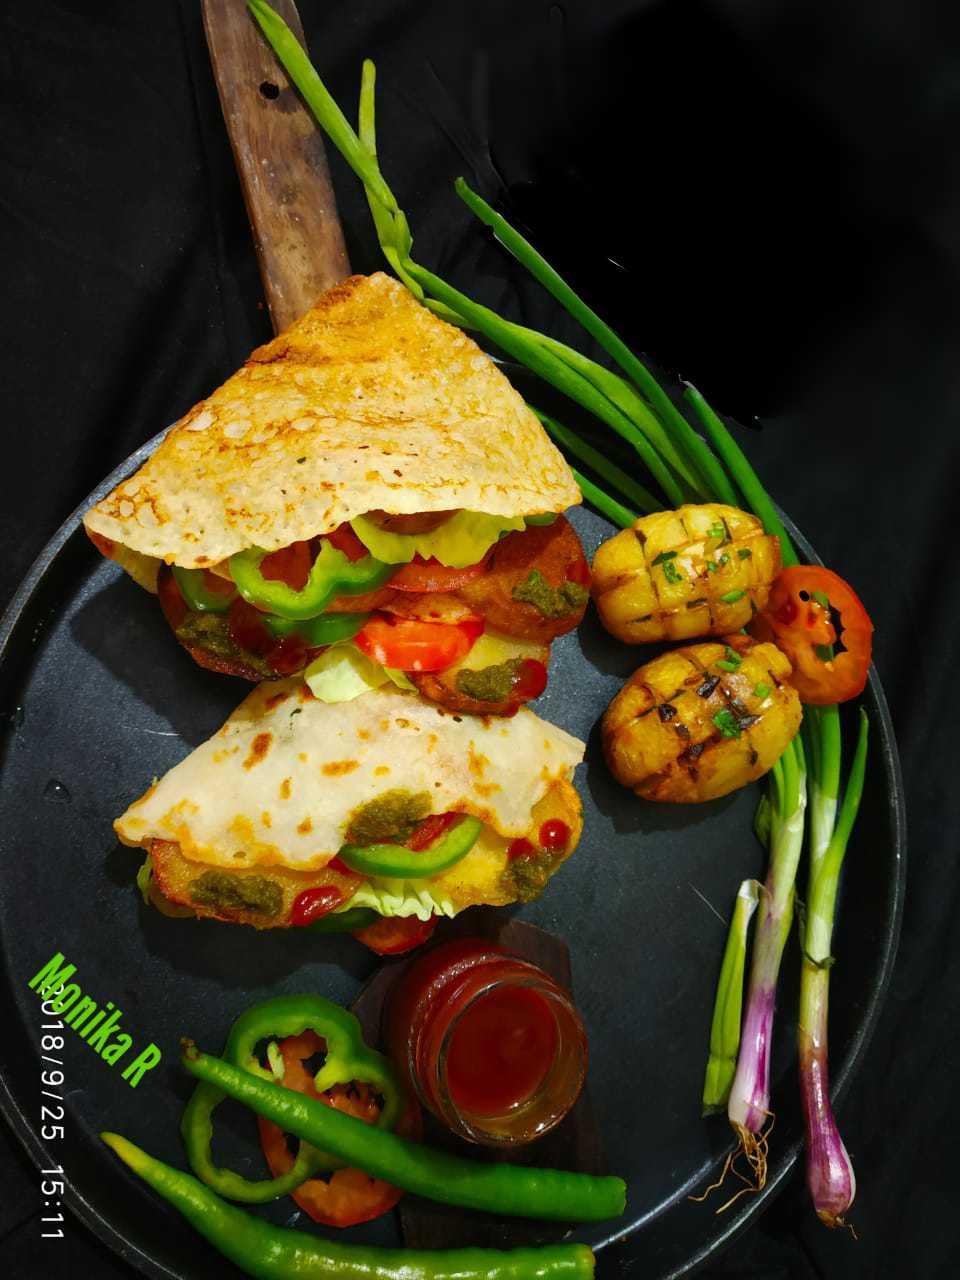 Veggie Loaded Quesadilla (mexican wrap)